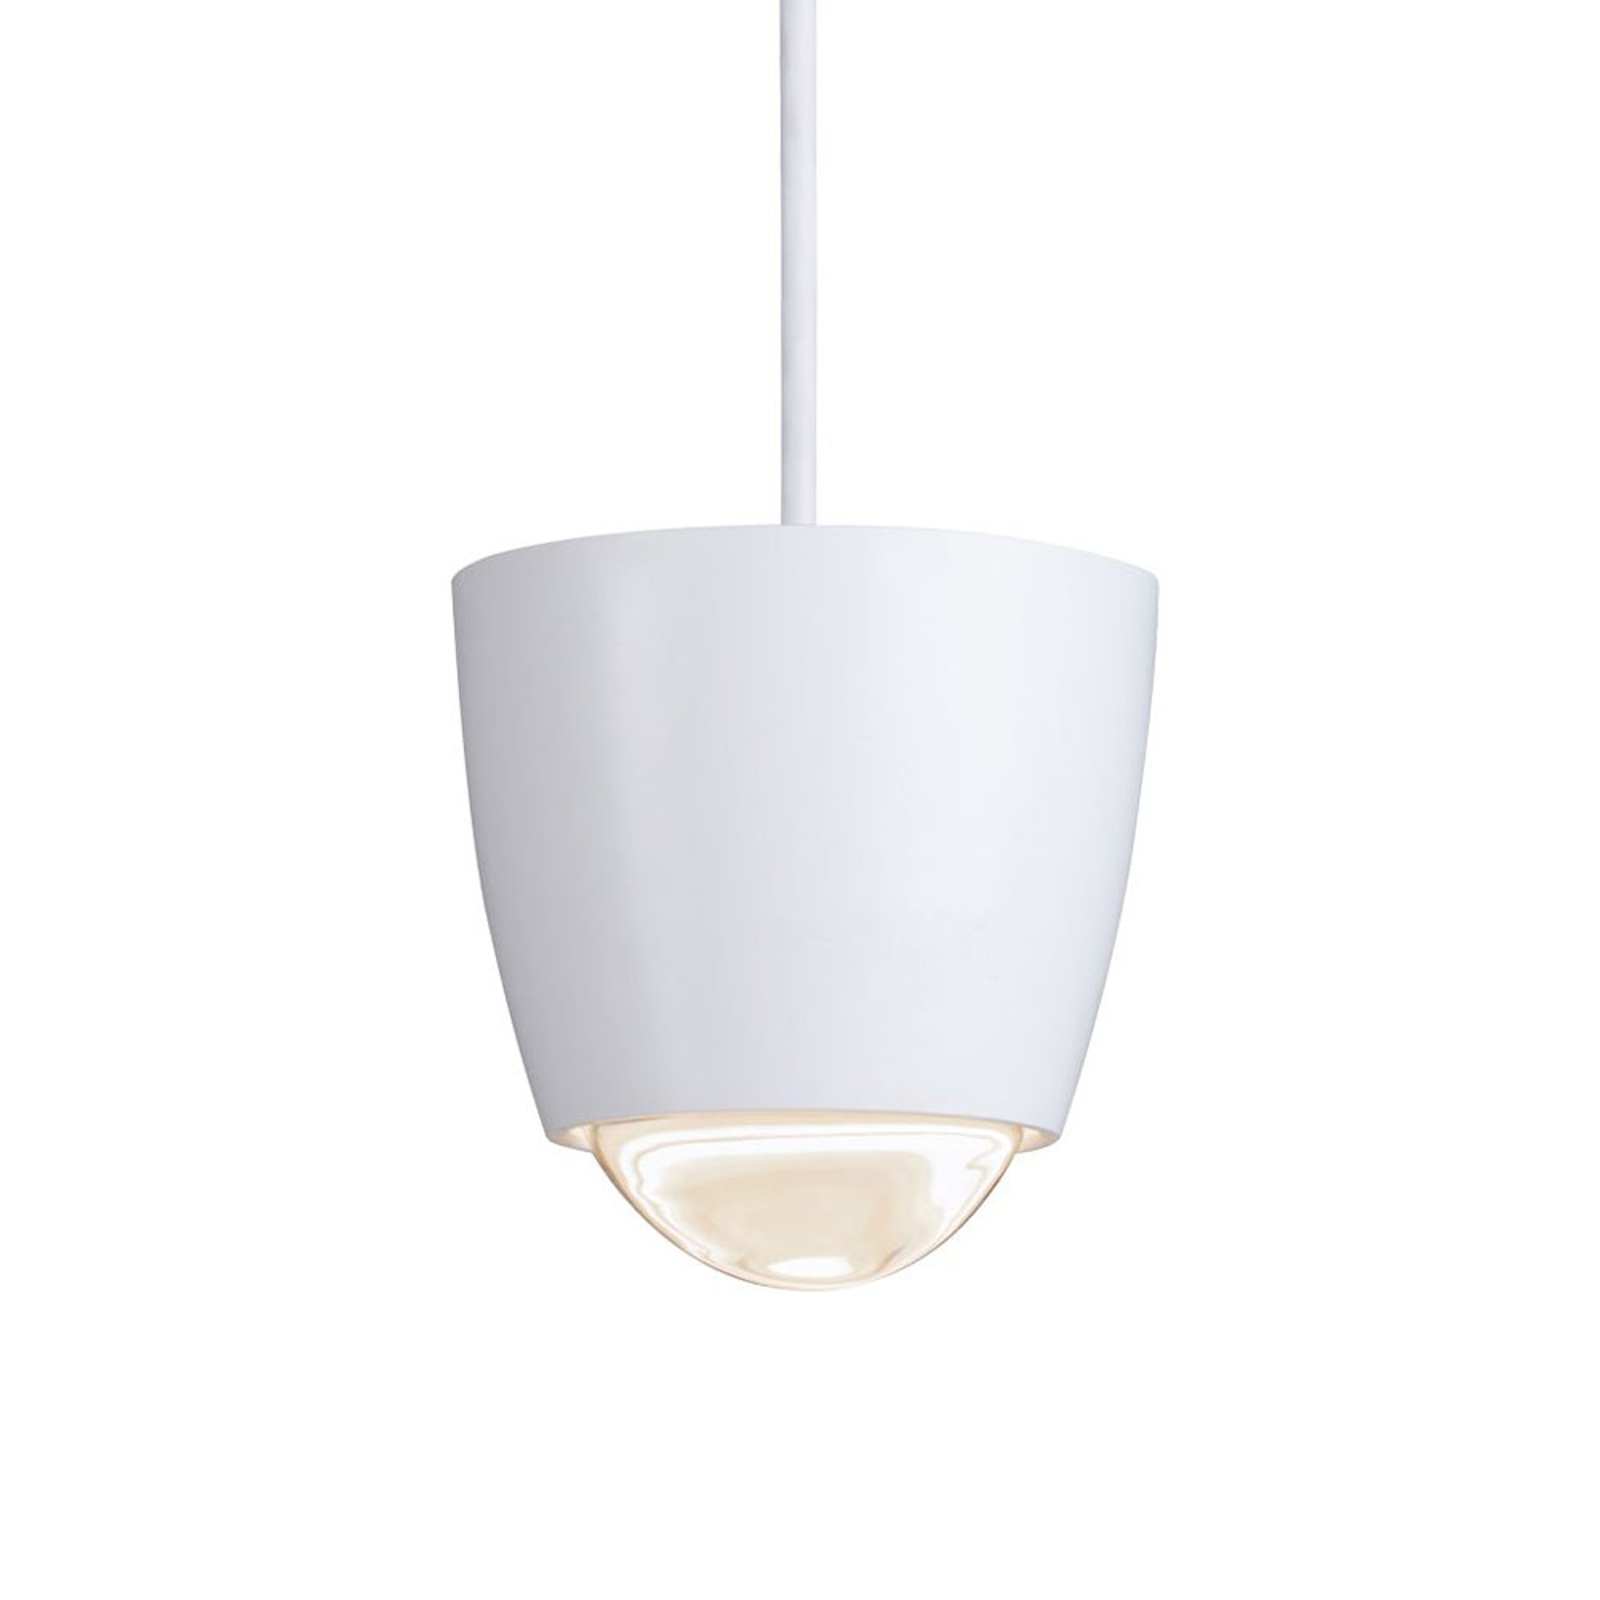 Paulmann NanoRail Cono LED-Pendelleuchte, weiß